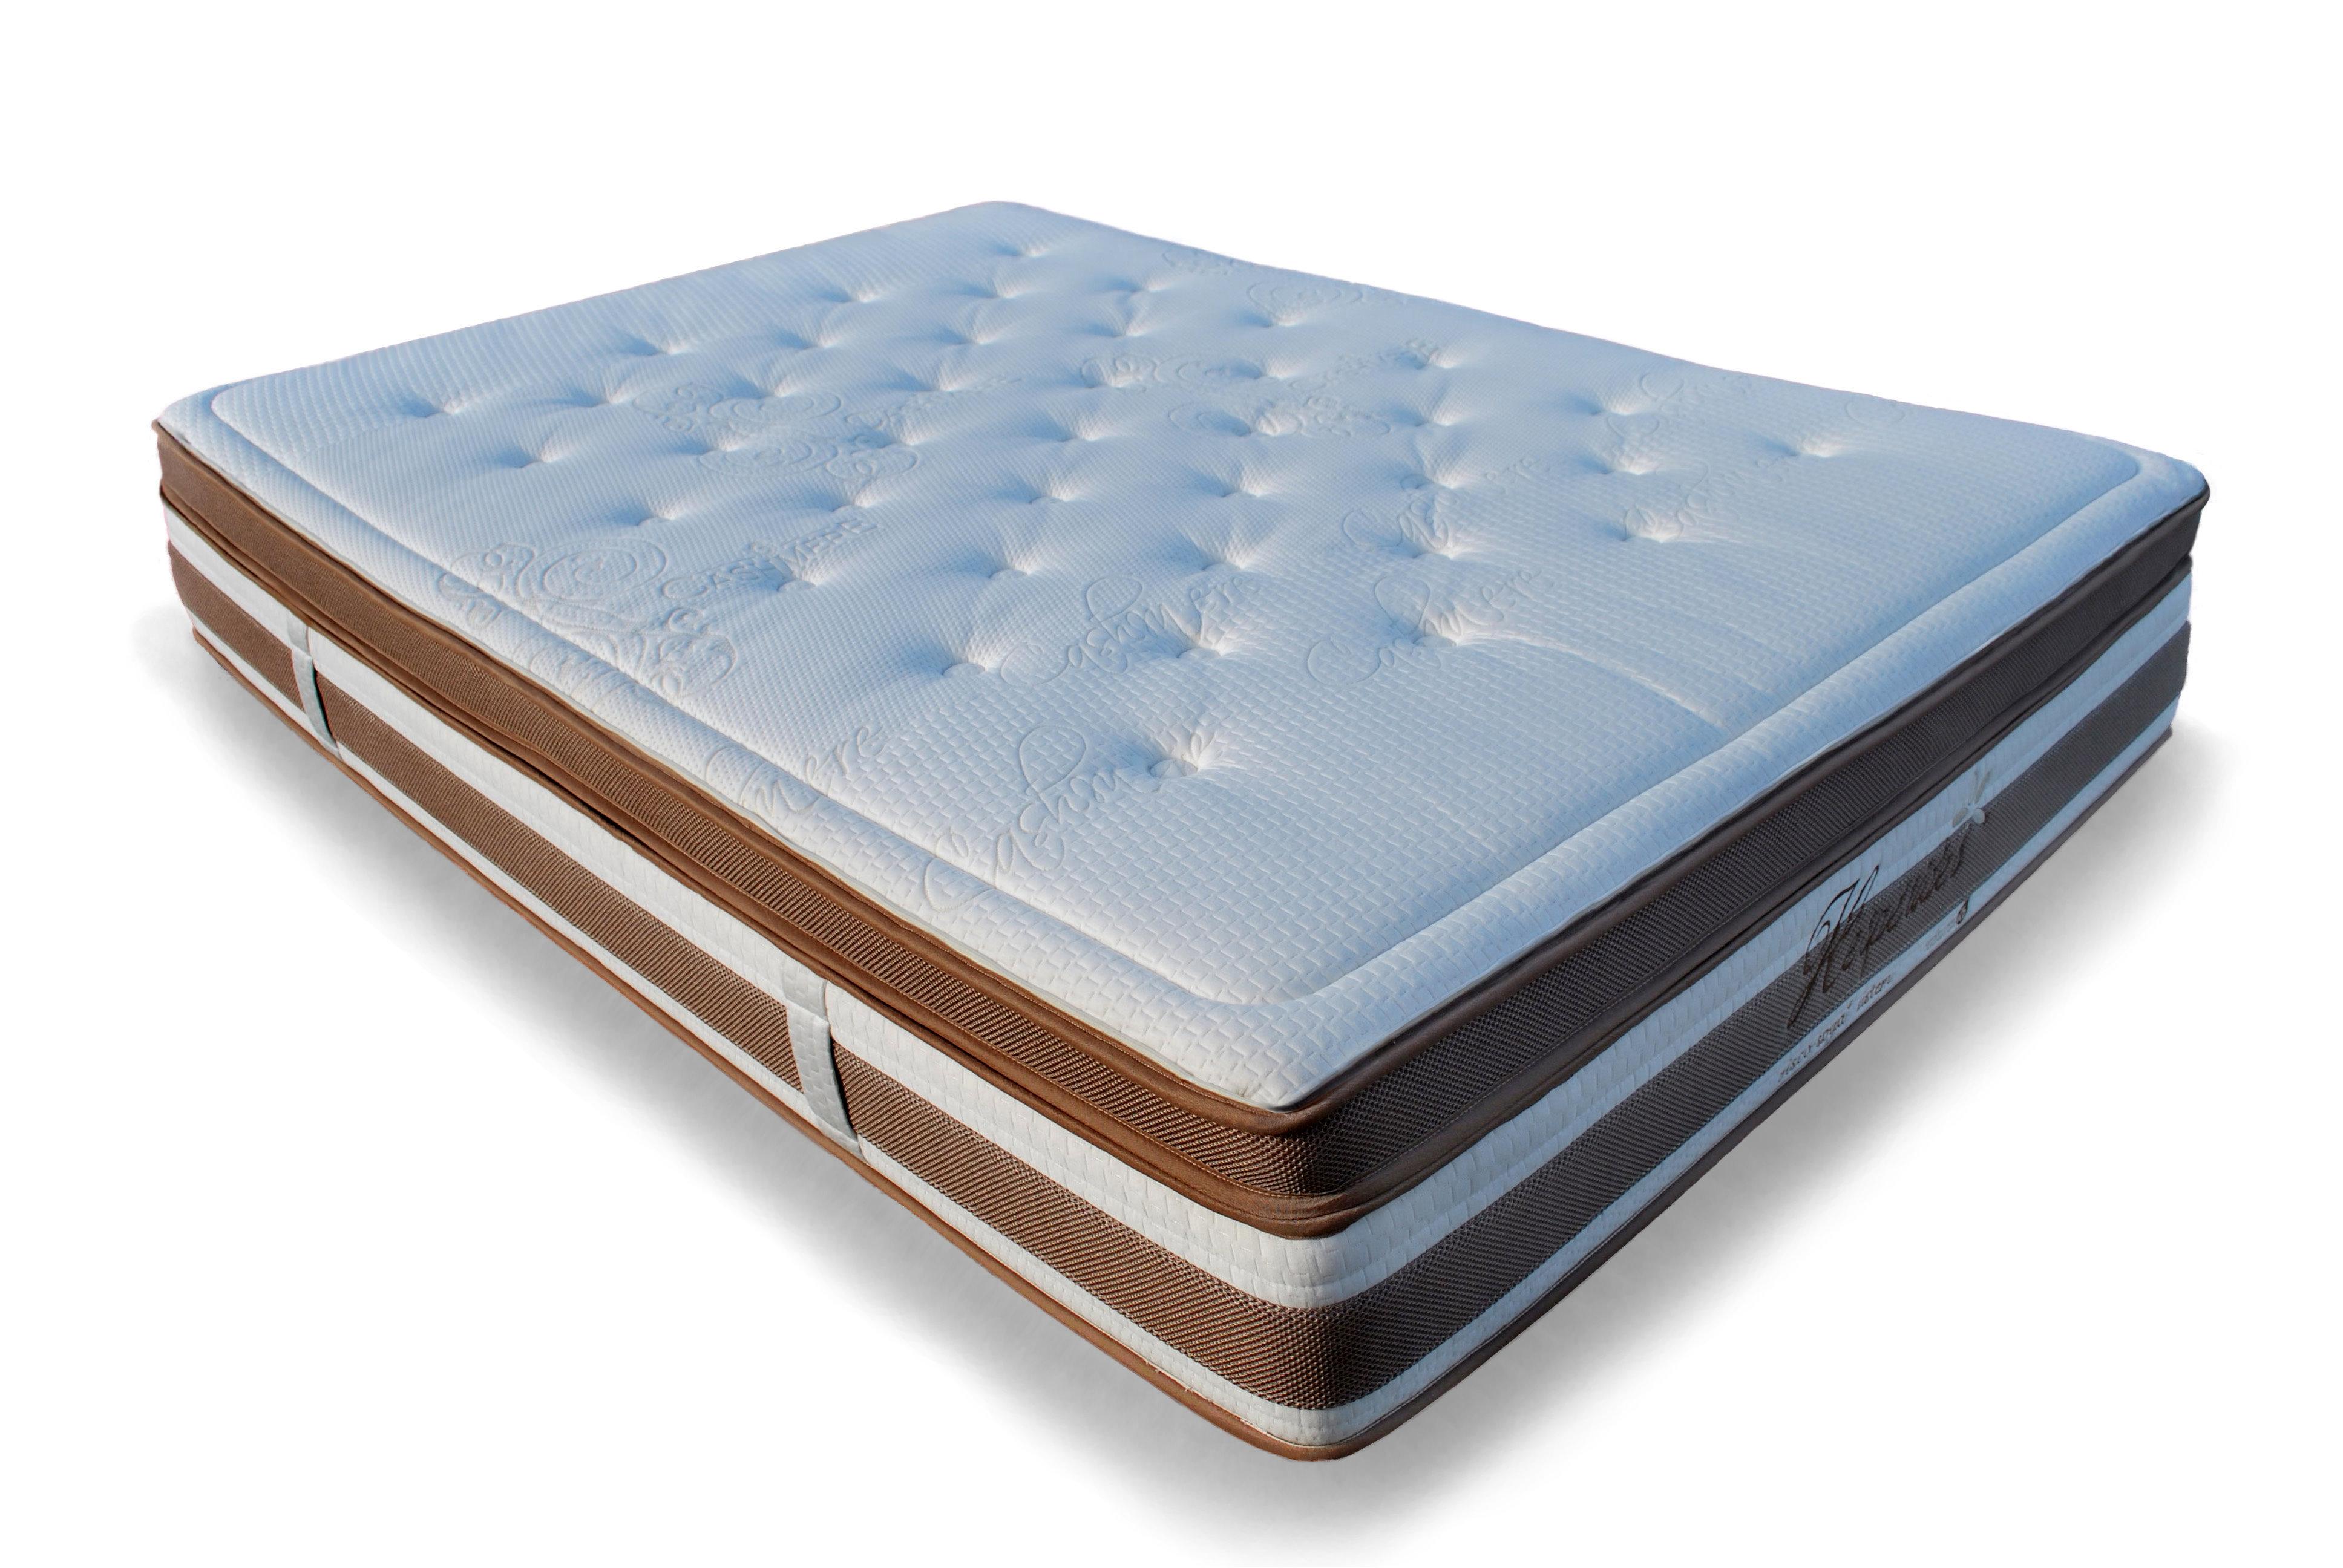 Tempurpedic Mattress Topper Reviews naturalia lux mattress lux mattress by naturalia